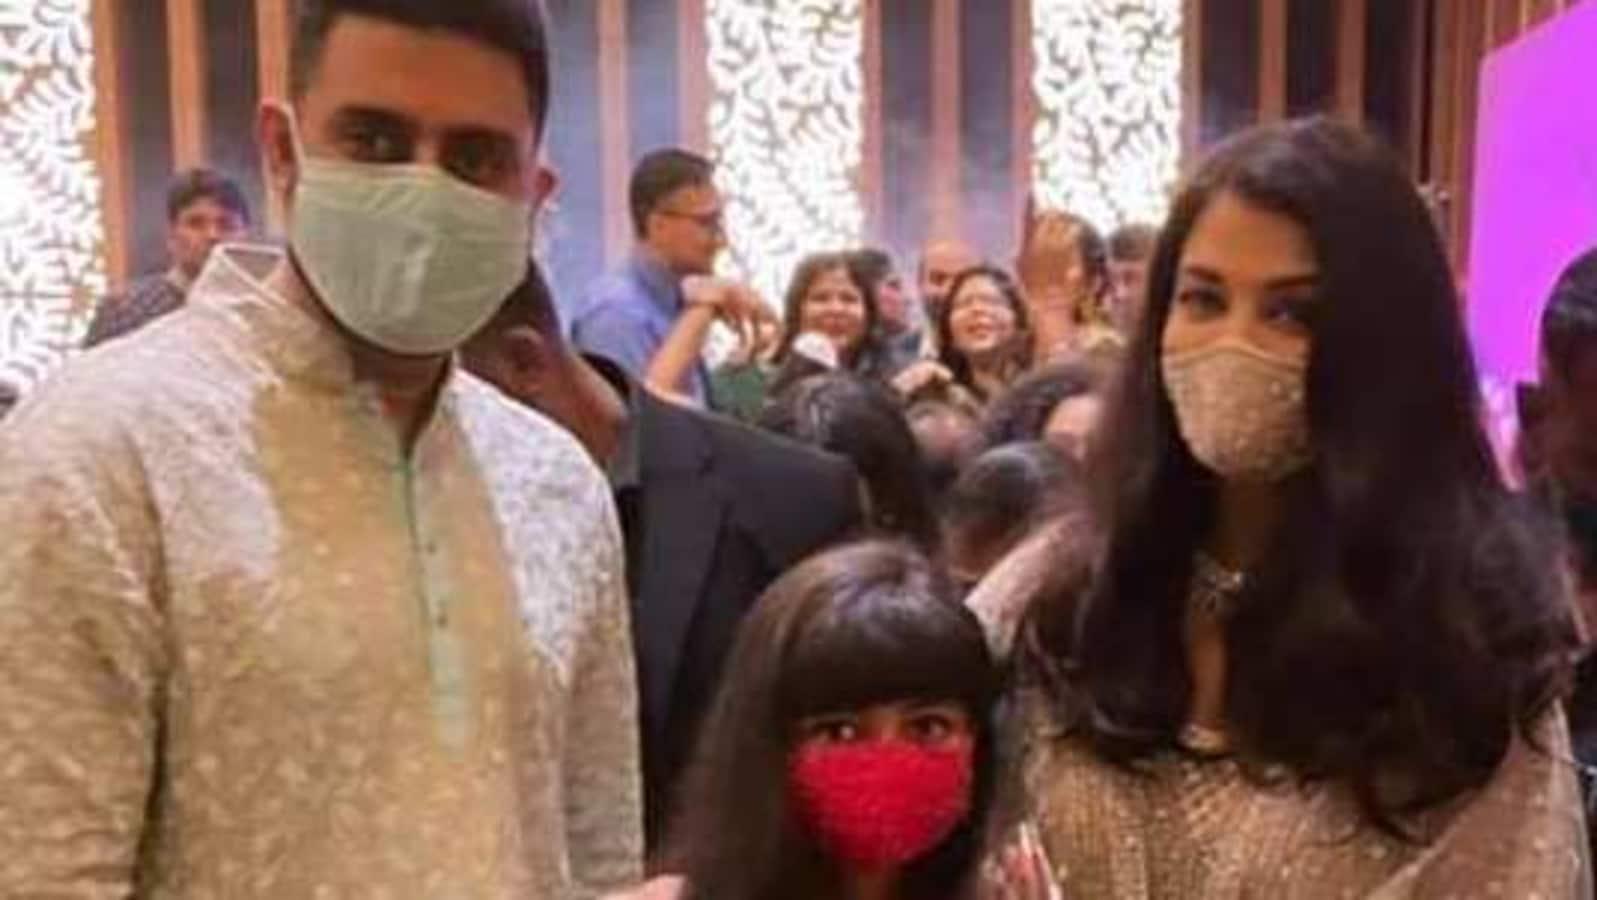 Aishwarya Rai, Abhishek Bachchan, Aaradhya spotted at wedding; check out their matching masks - Hindustan Times